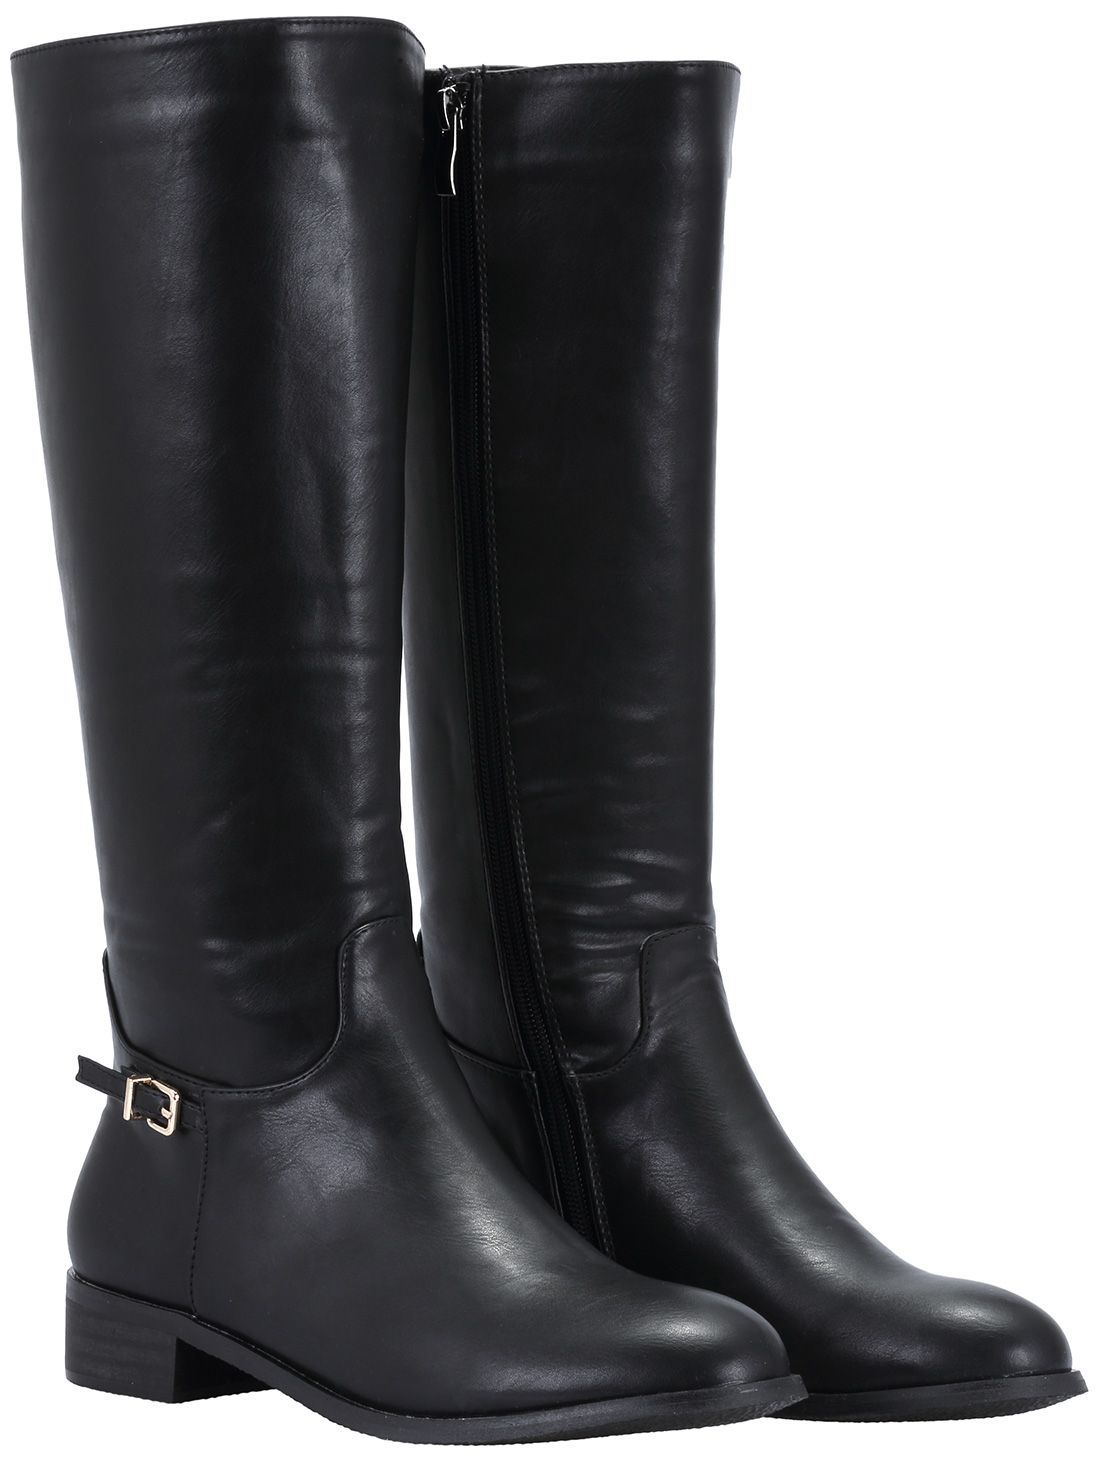 35991febac24 Black Zipper Buckle Strap Tall Boots 48.07